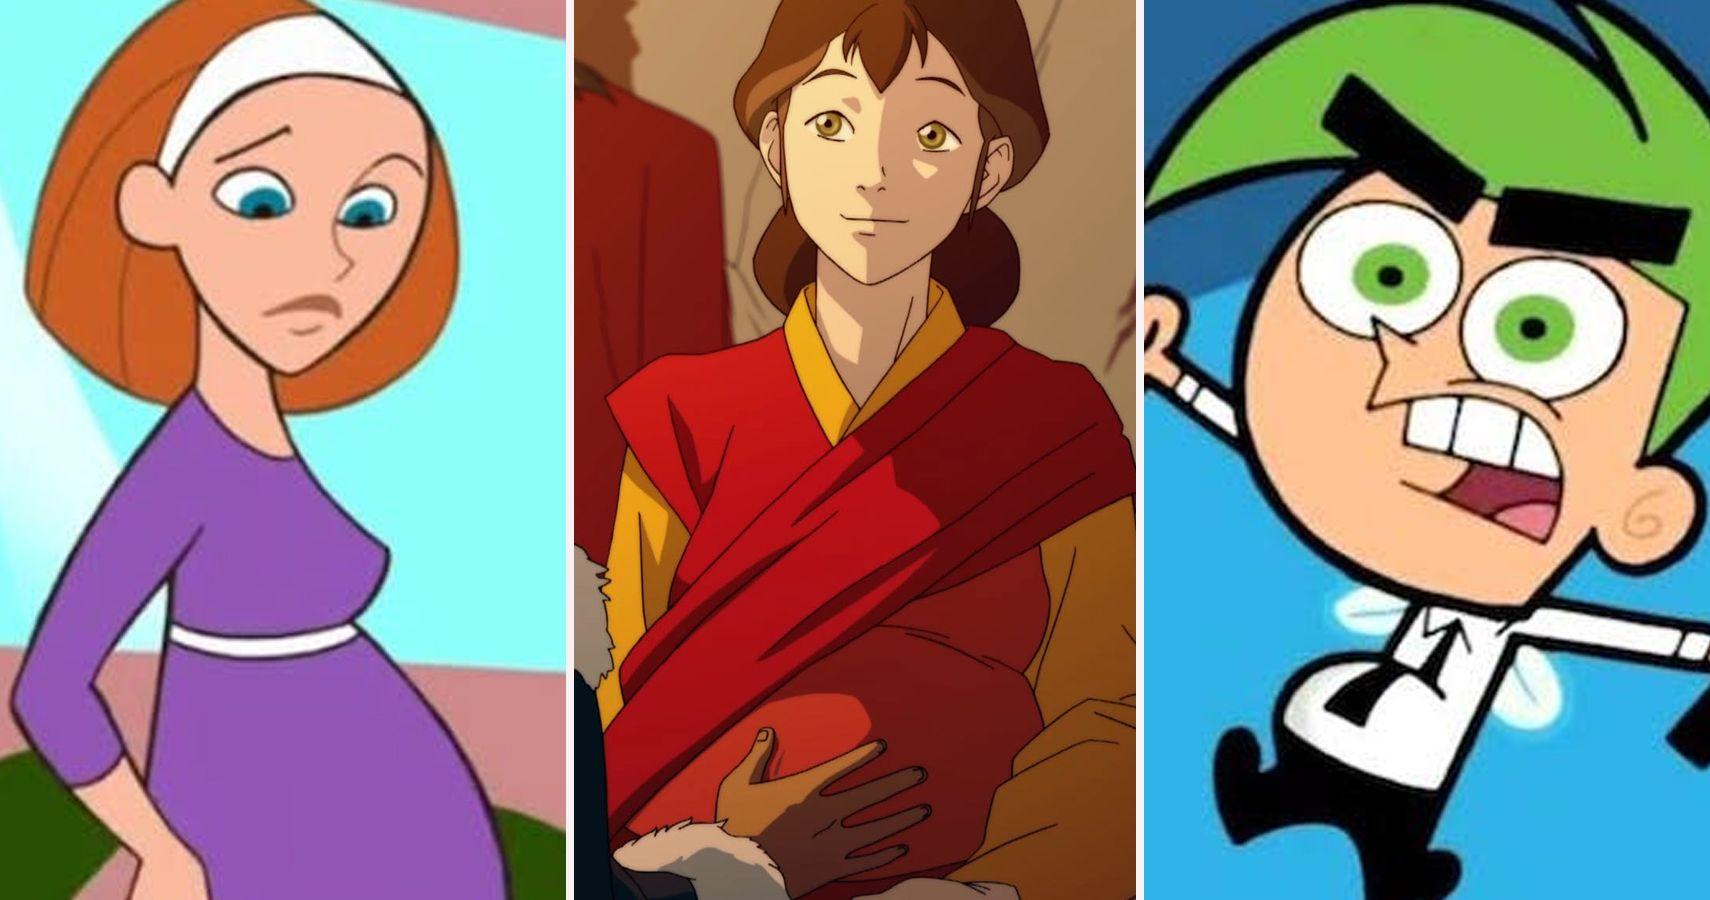 24 Weird Times Pregnancy Showed Up In Kids Cartoons | TheGamer